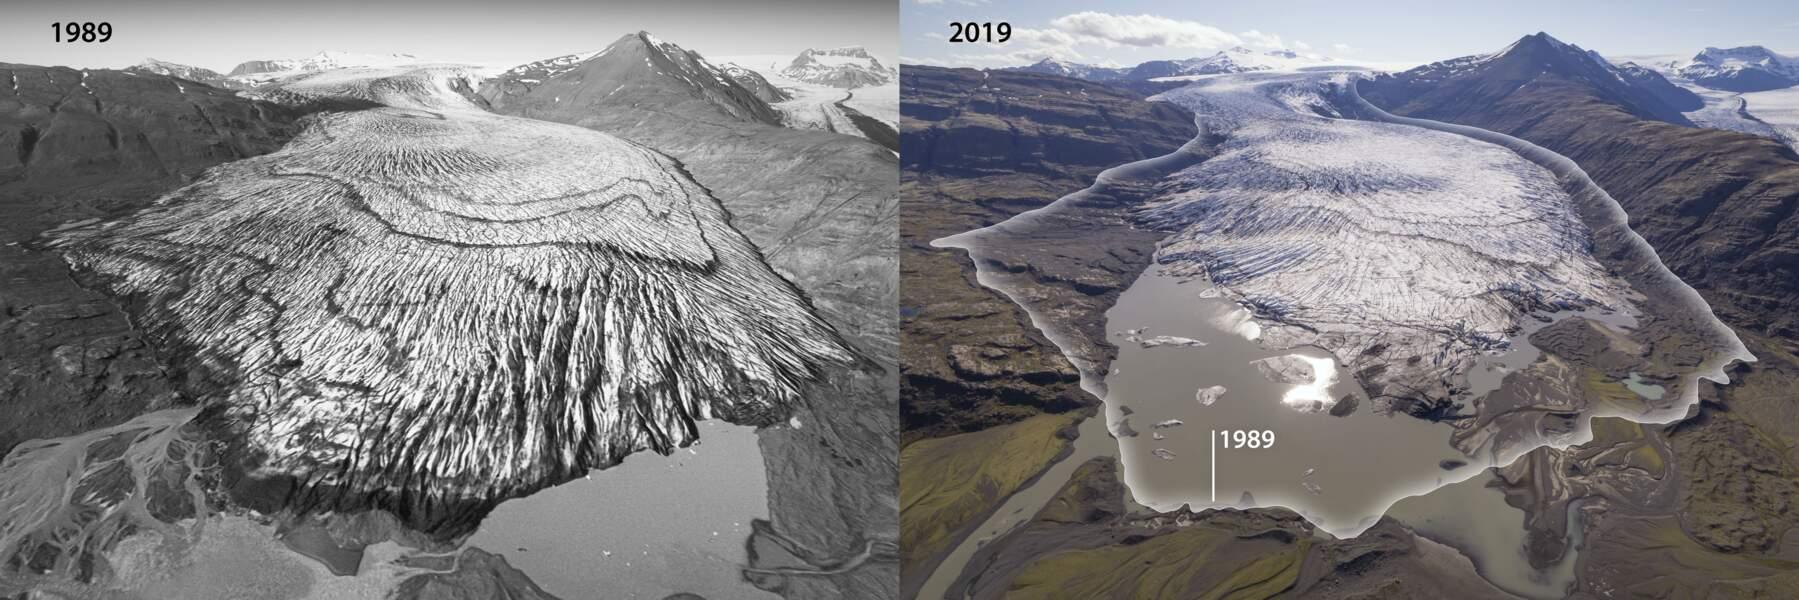 Skálafellsjökull en 1989 et en 2019